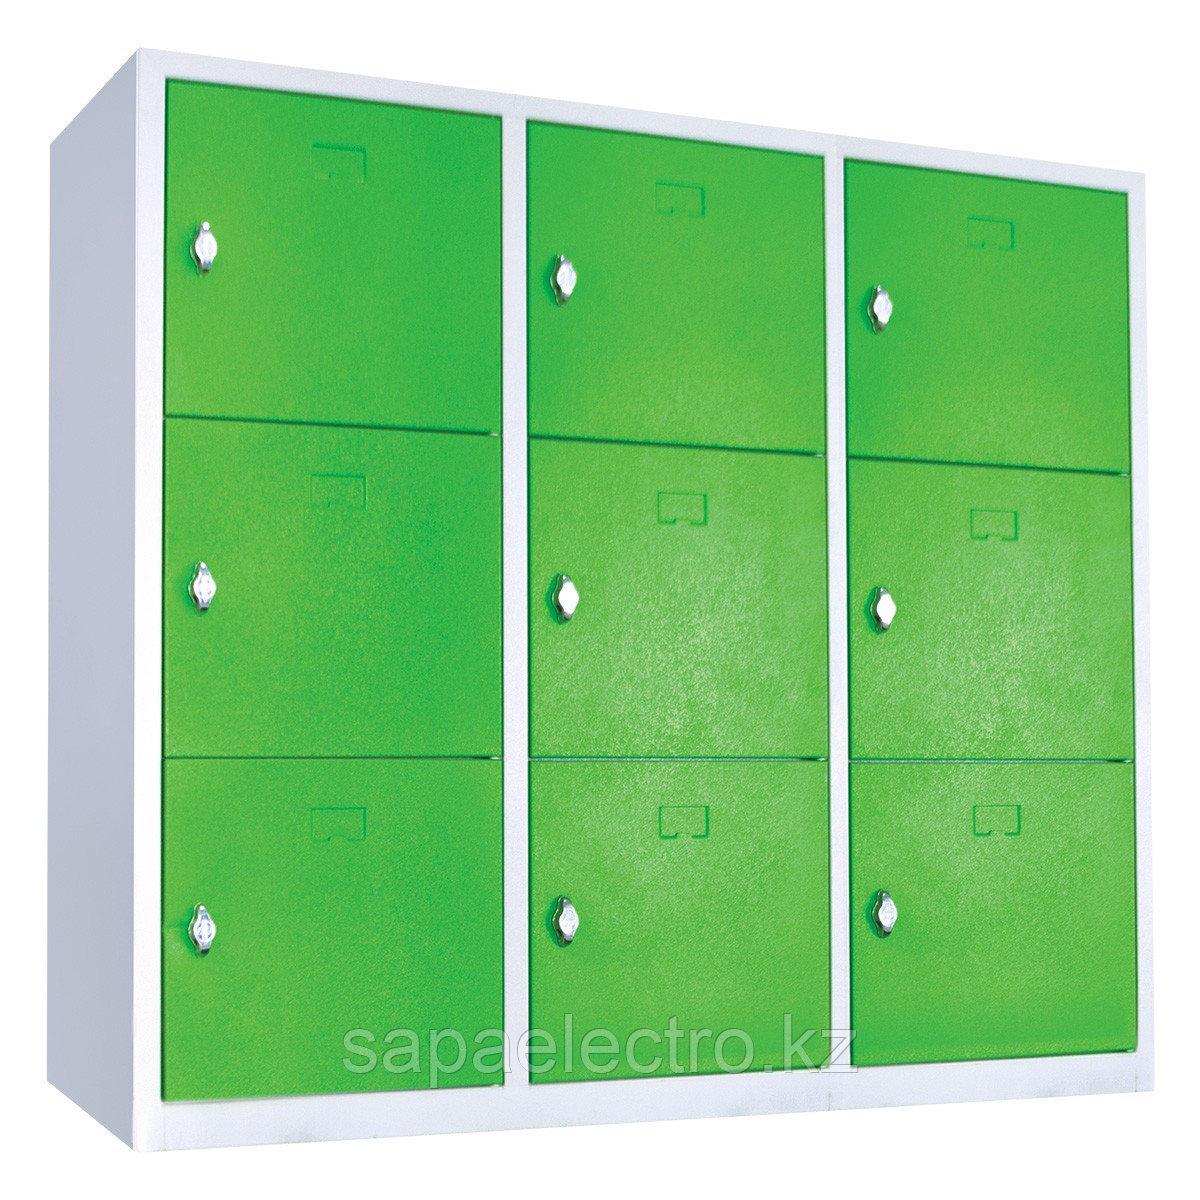 Металл. Книжный шкаф для школы 1300x400x1300 MGL